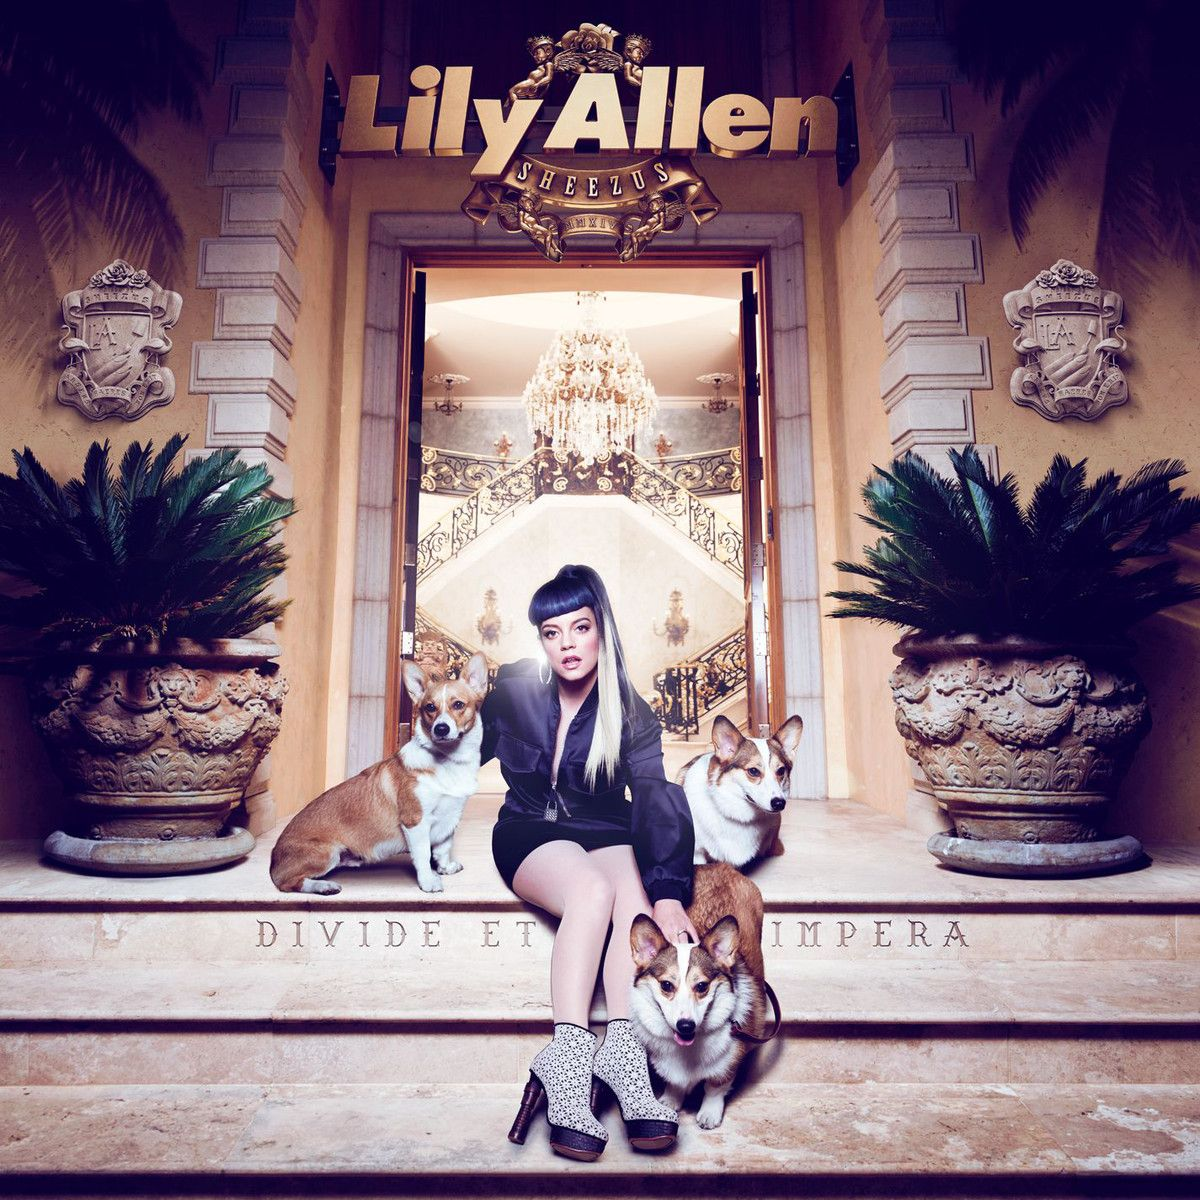 Lily Allen - Sheezus album cover